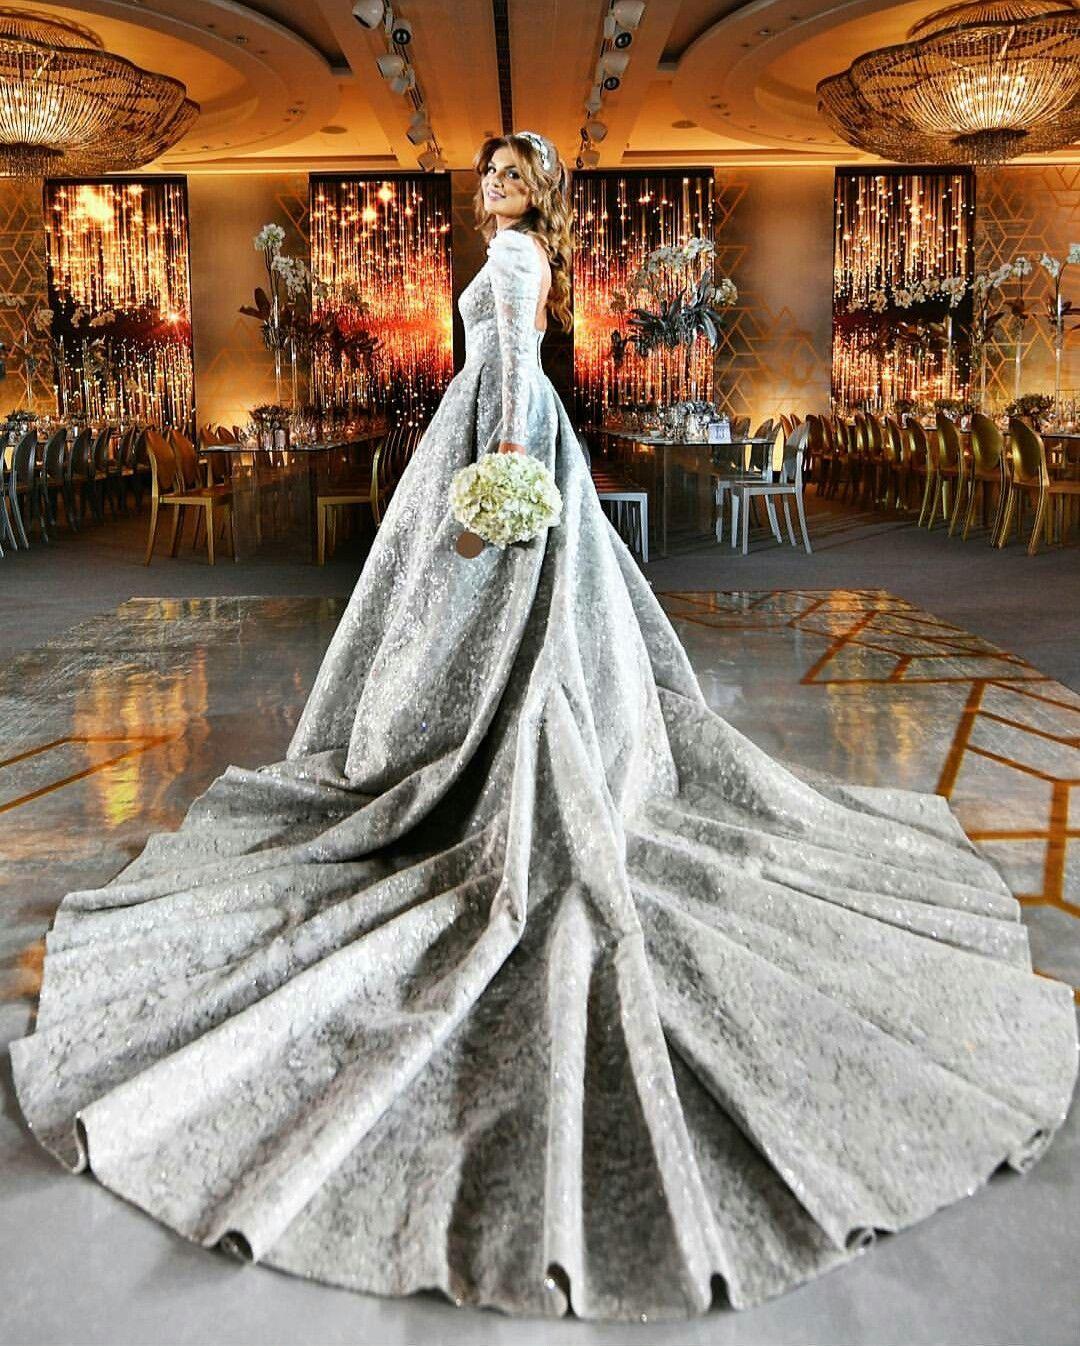 Make Your Own Wedding Dress: Dazzling Bride Wearing Her Own Design 😍😍